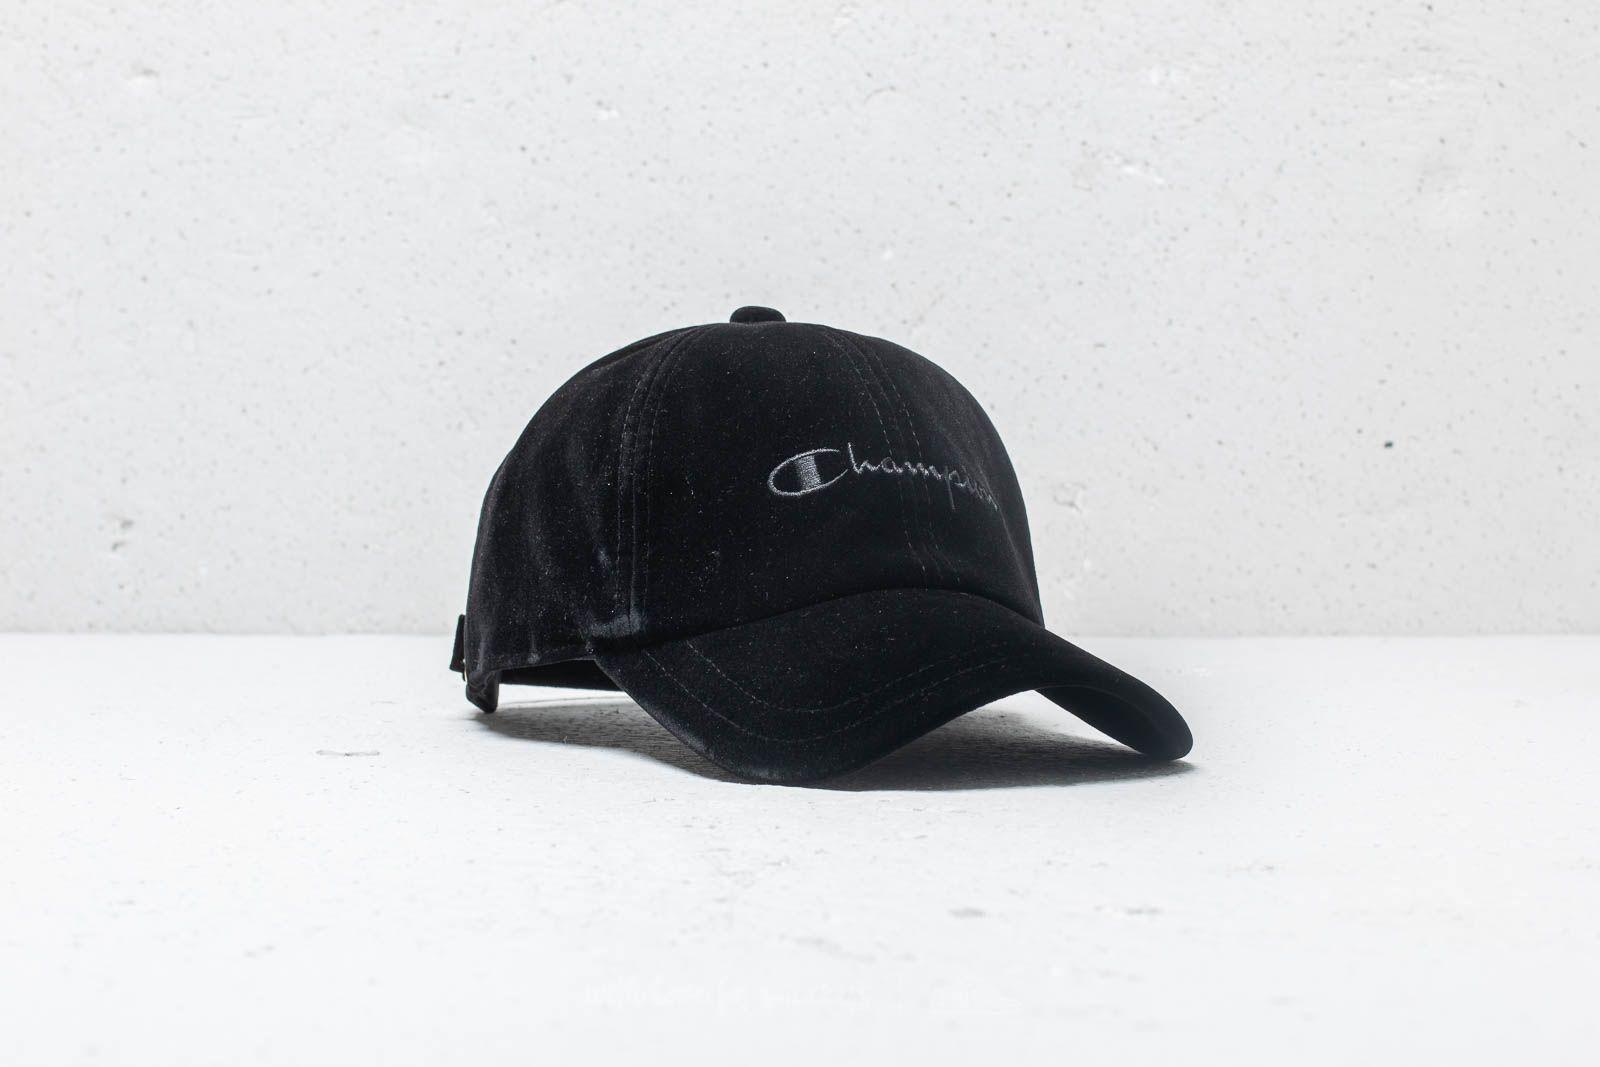 7b575e50f78 Champion Cap Black